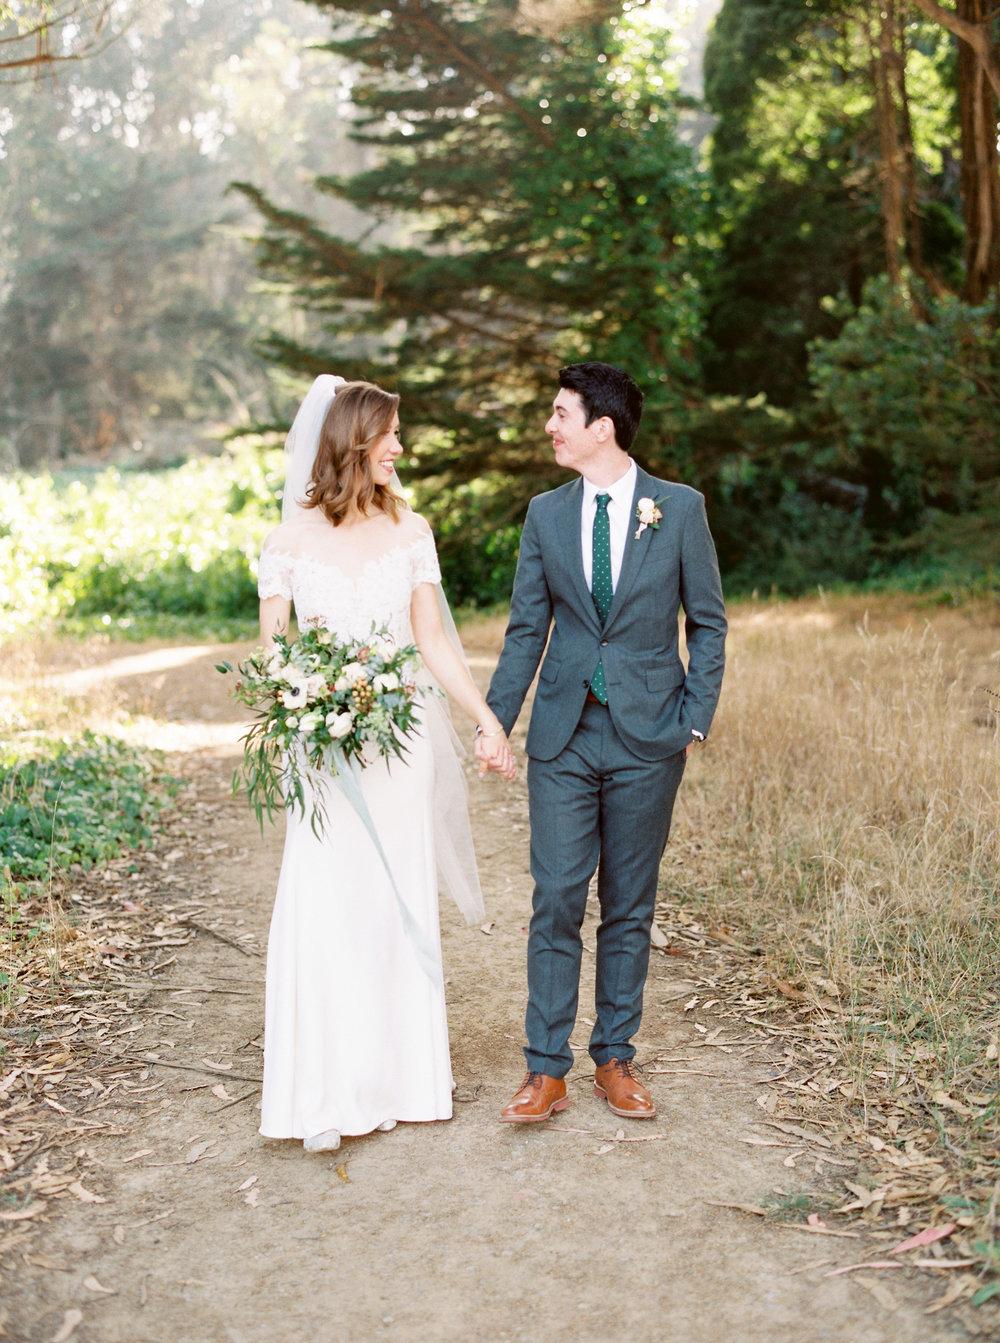 Log-cabin-wedding-in-presidio-san-francisco-california-desintation-wedding-photography-59.jpg